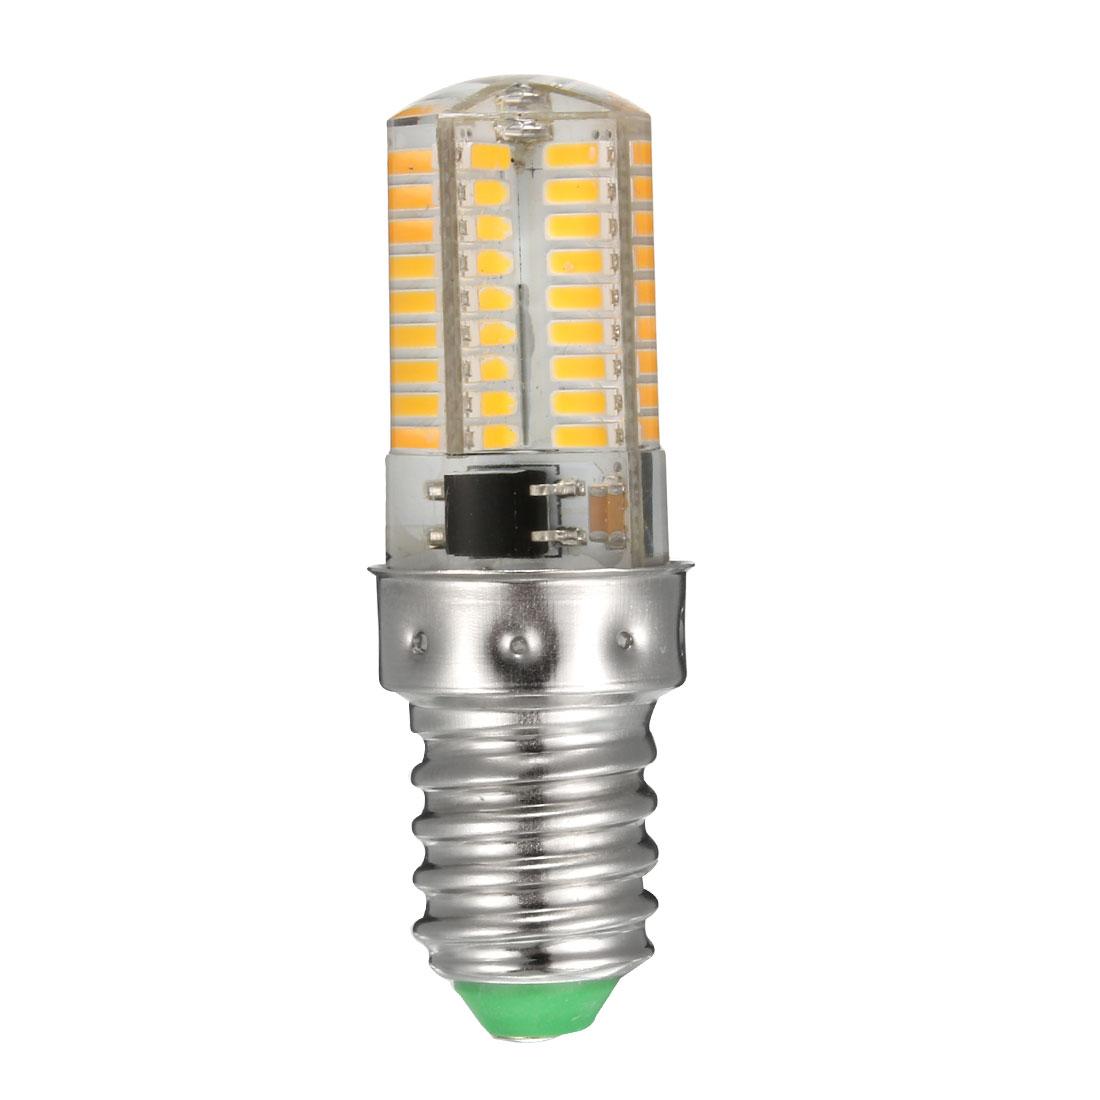 E14 Base LED Bulb 3W AC200-240V 72x3014SMD Silicone Corn Light Bulb Warm White